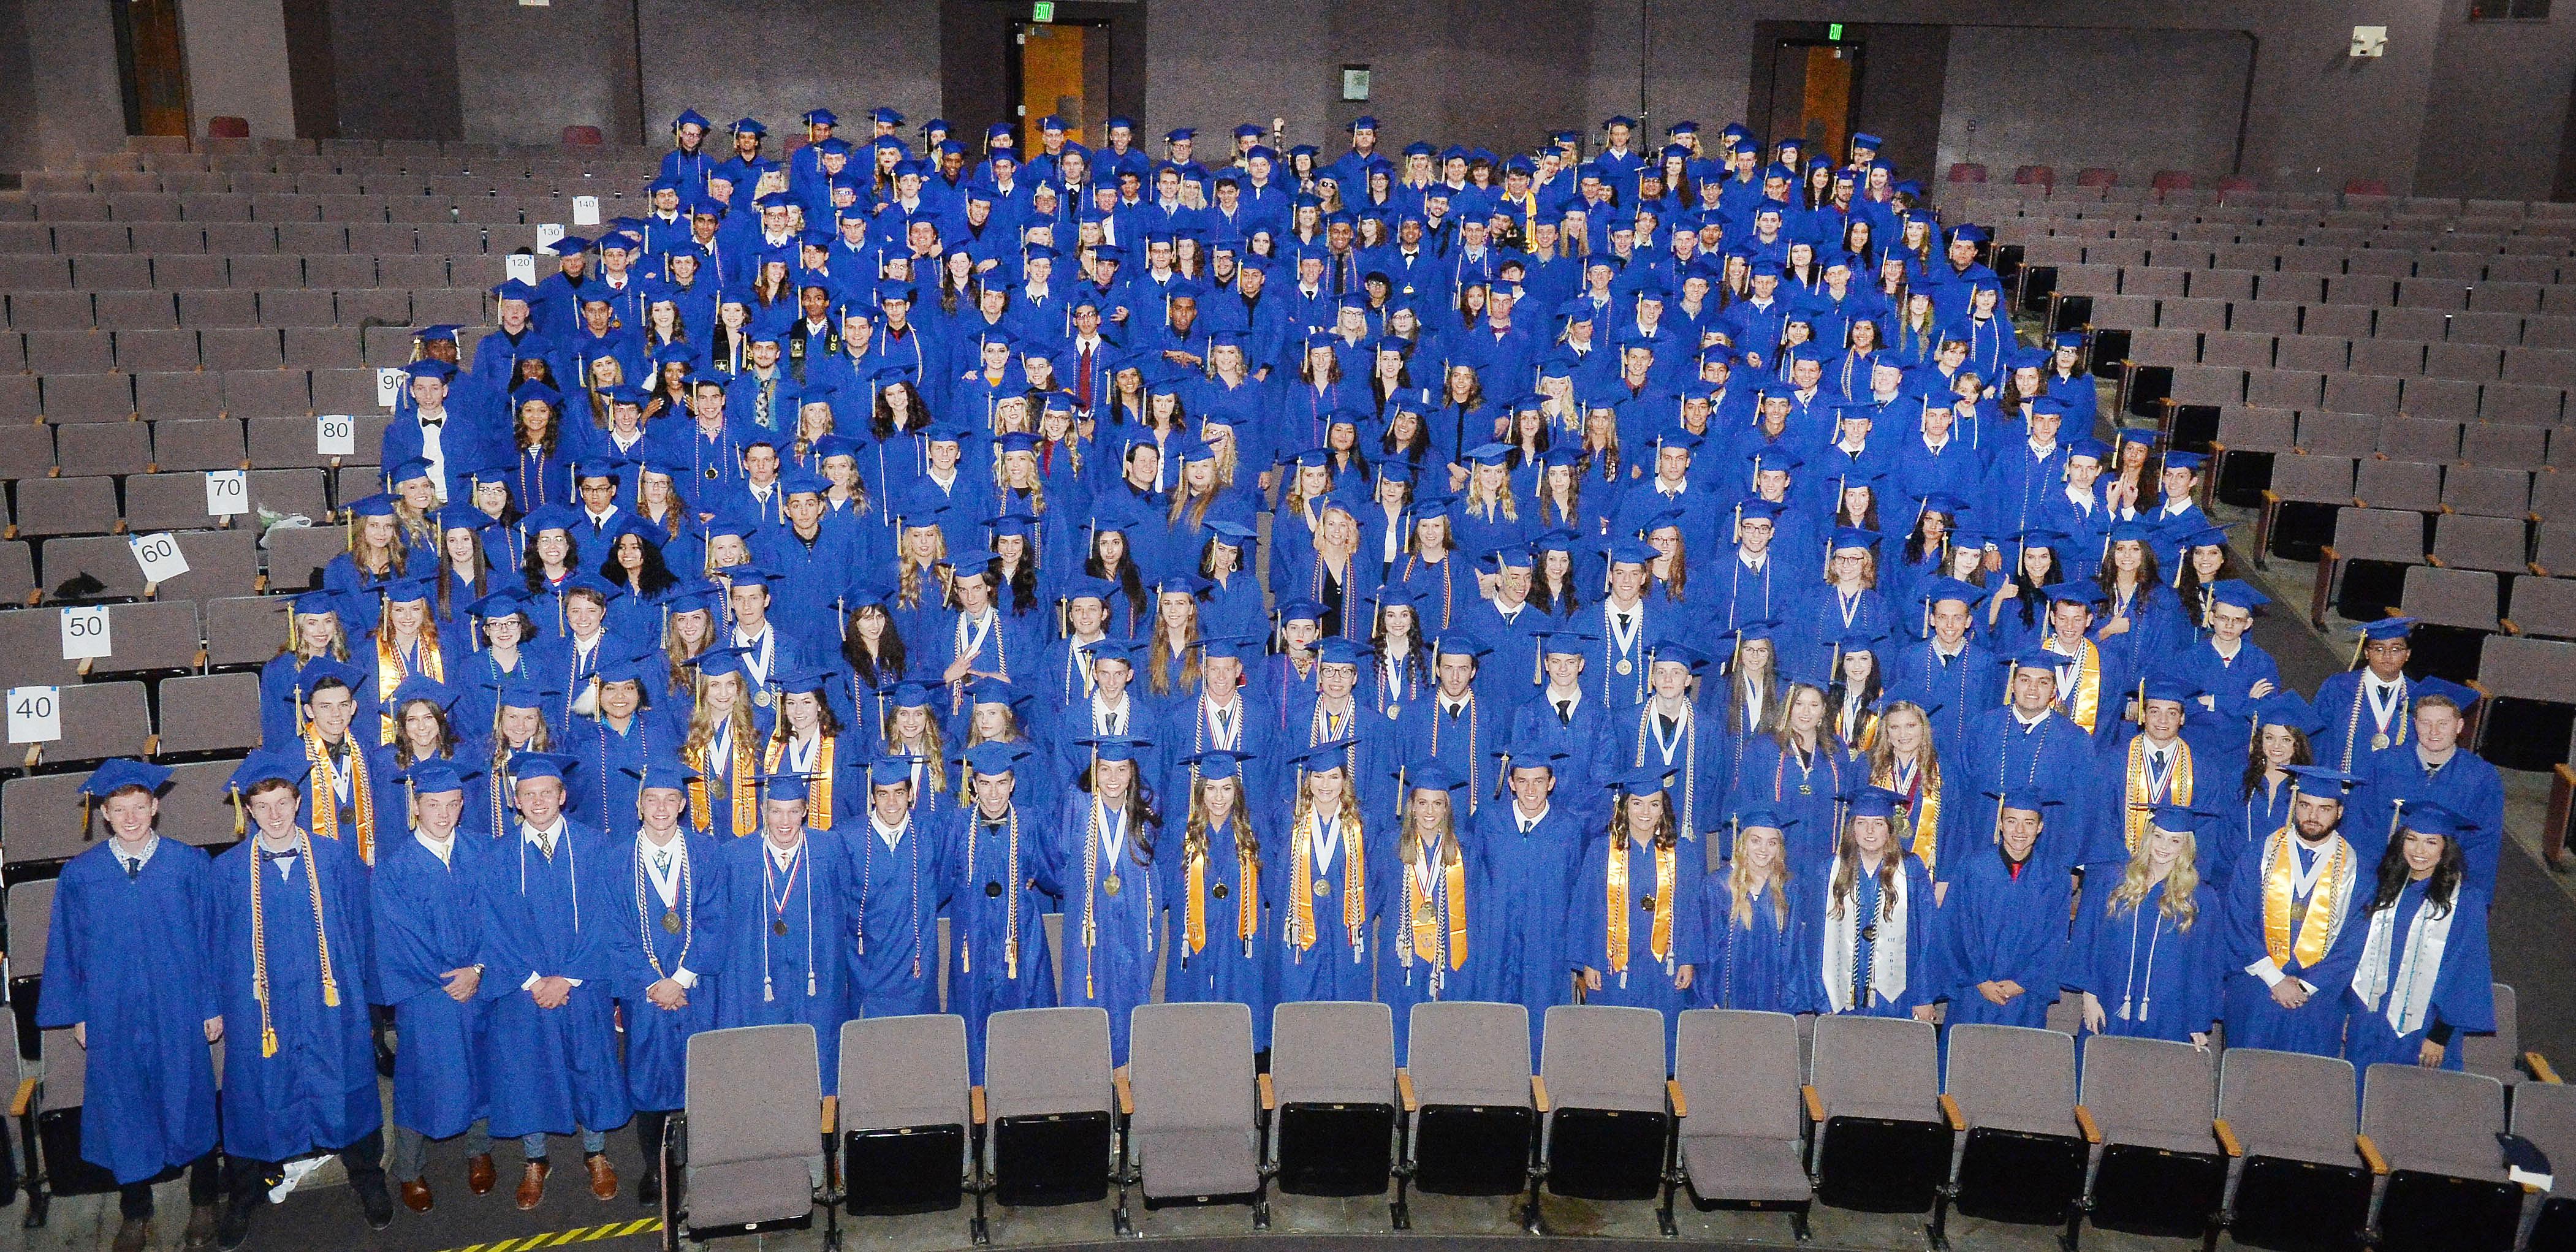 Gallery & Video: Prescott High School Graduation